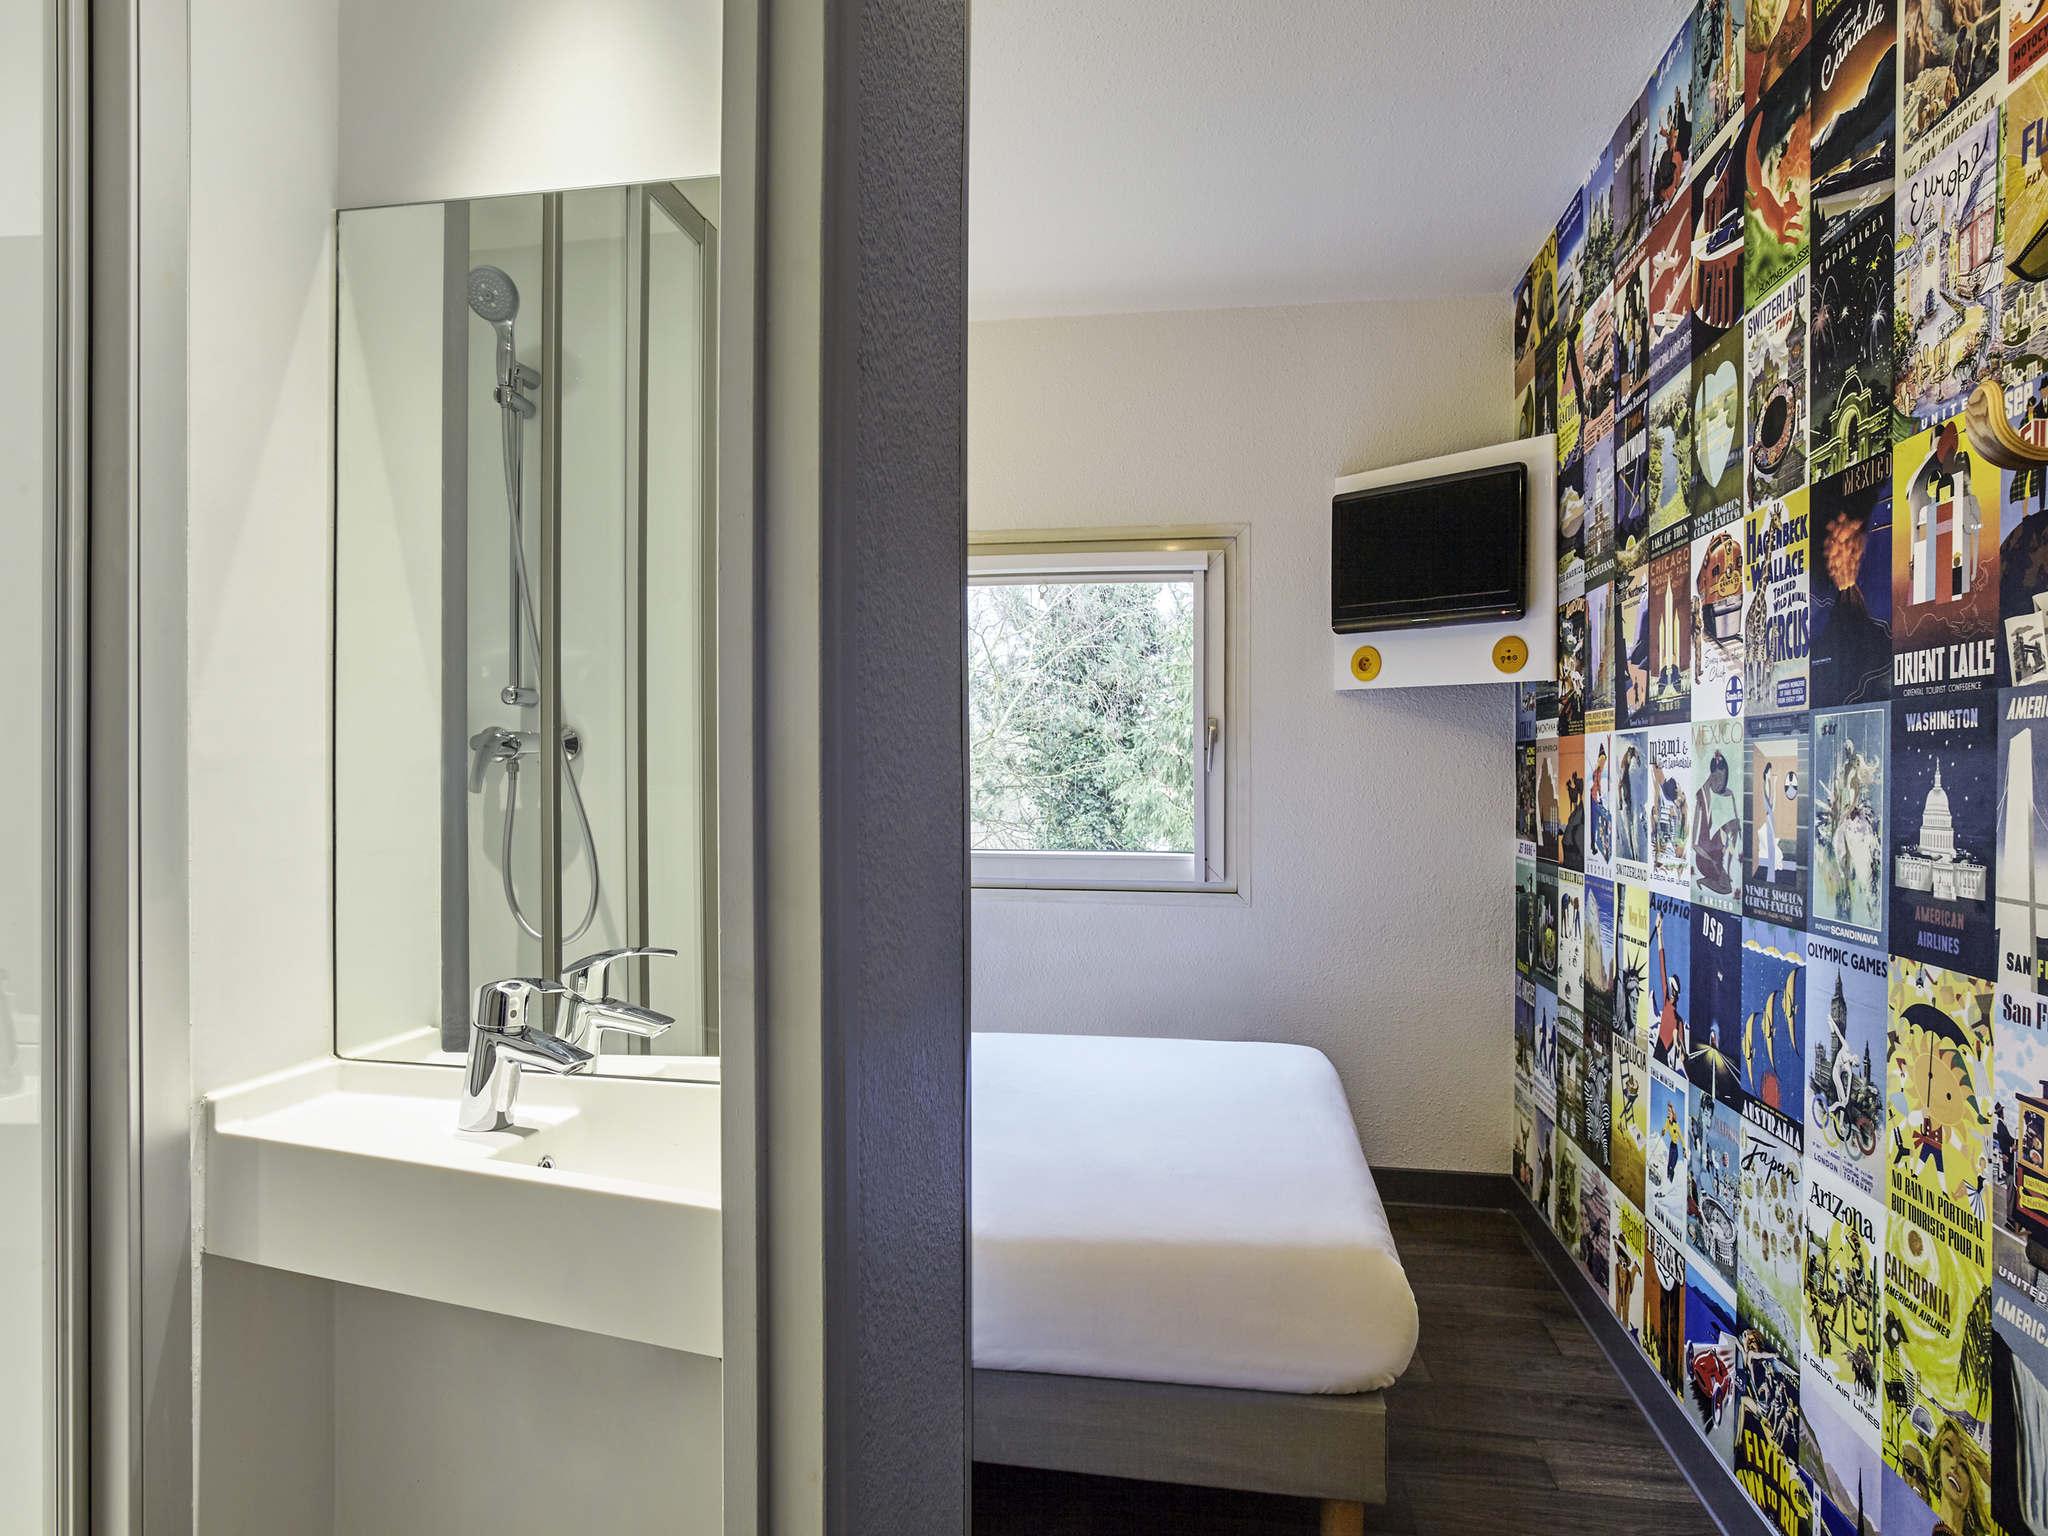 hotel in bagnolet hotelf1 parijs porte de montreuil. Black Bedroom Furniture Sets. Home Design Ideas